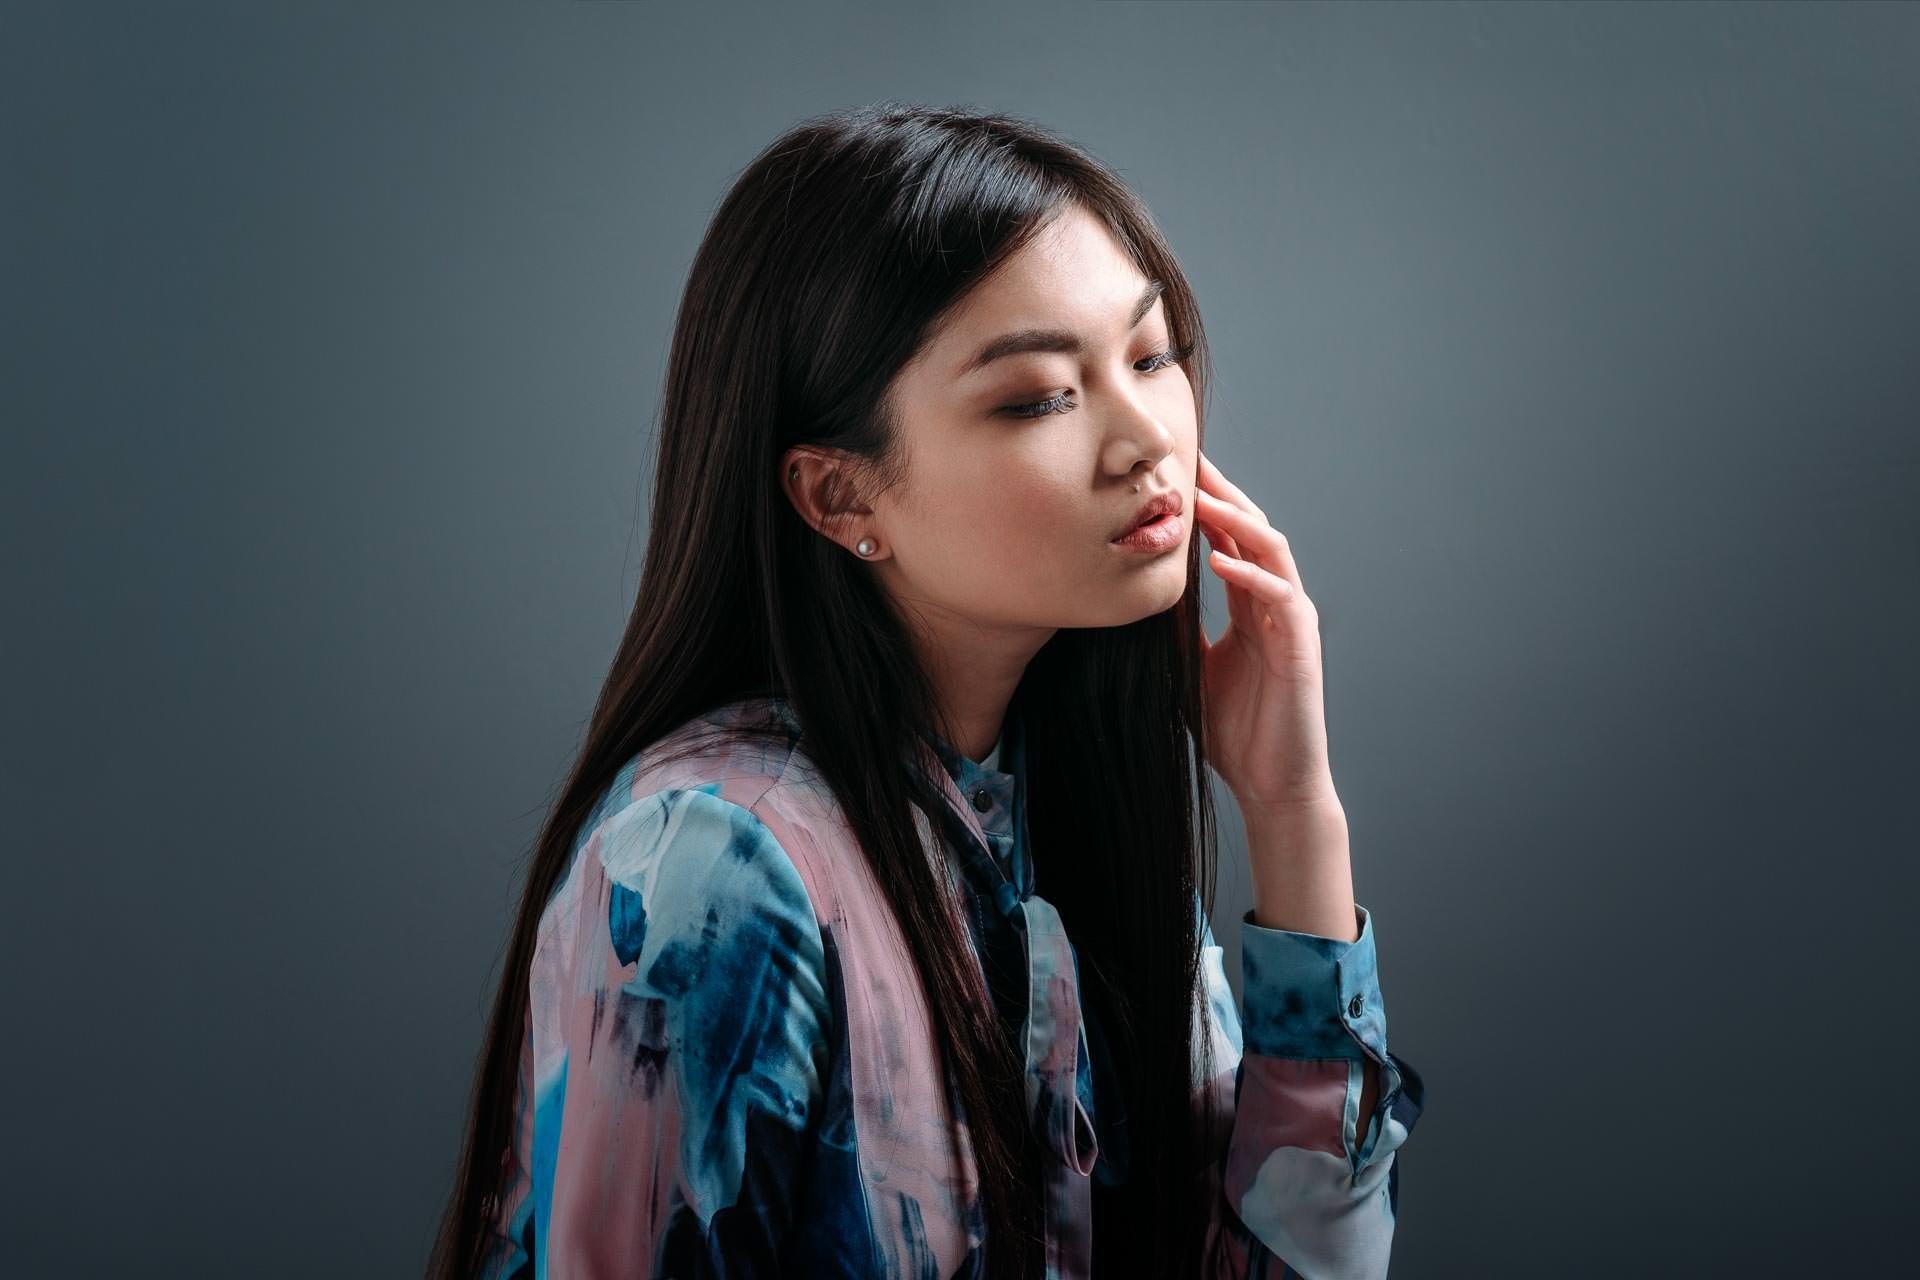 JCH_0064-Model-Headshot-Photographer